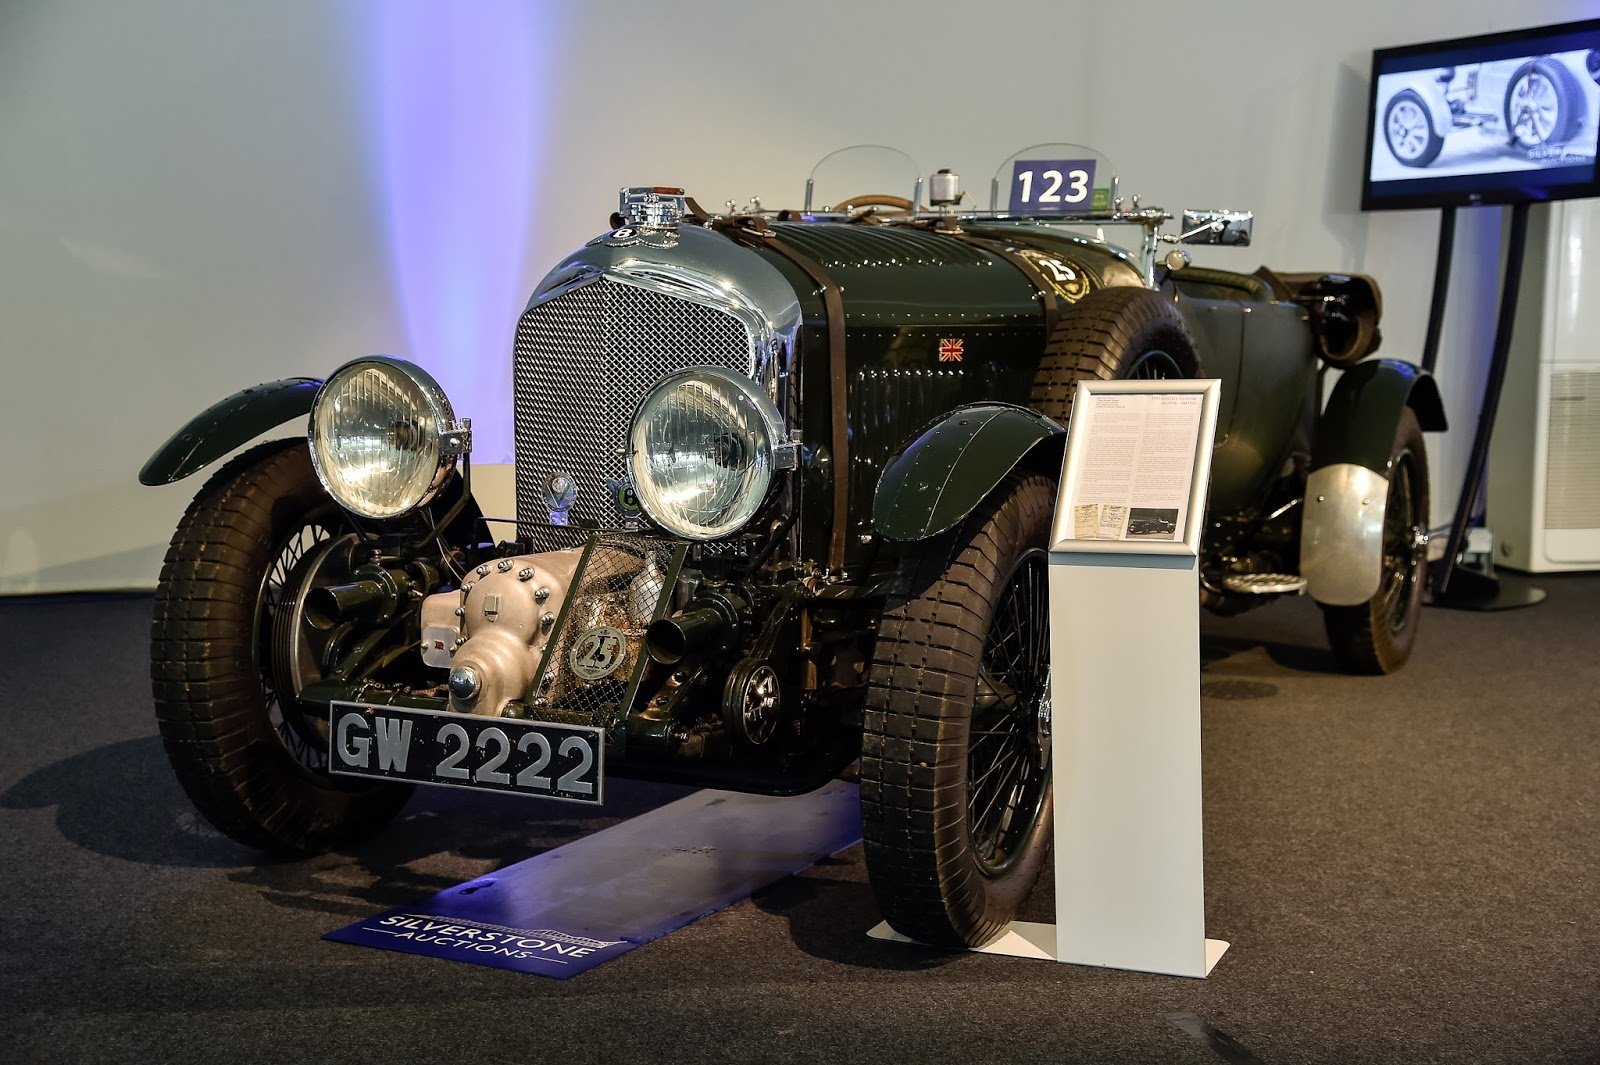 Salon Prive 2014 – Bentley